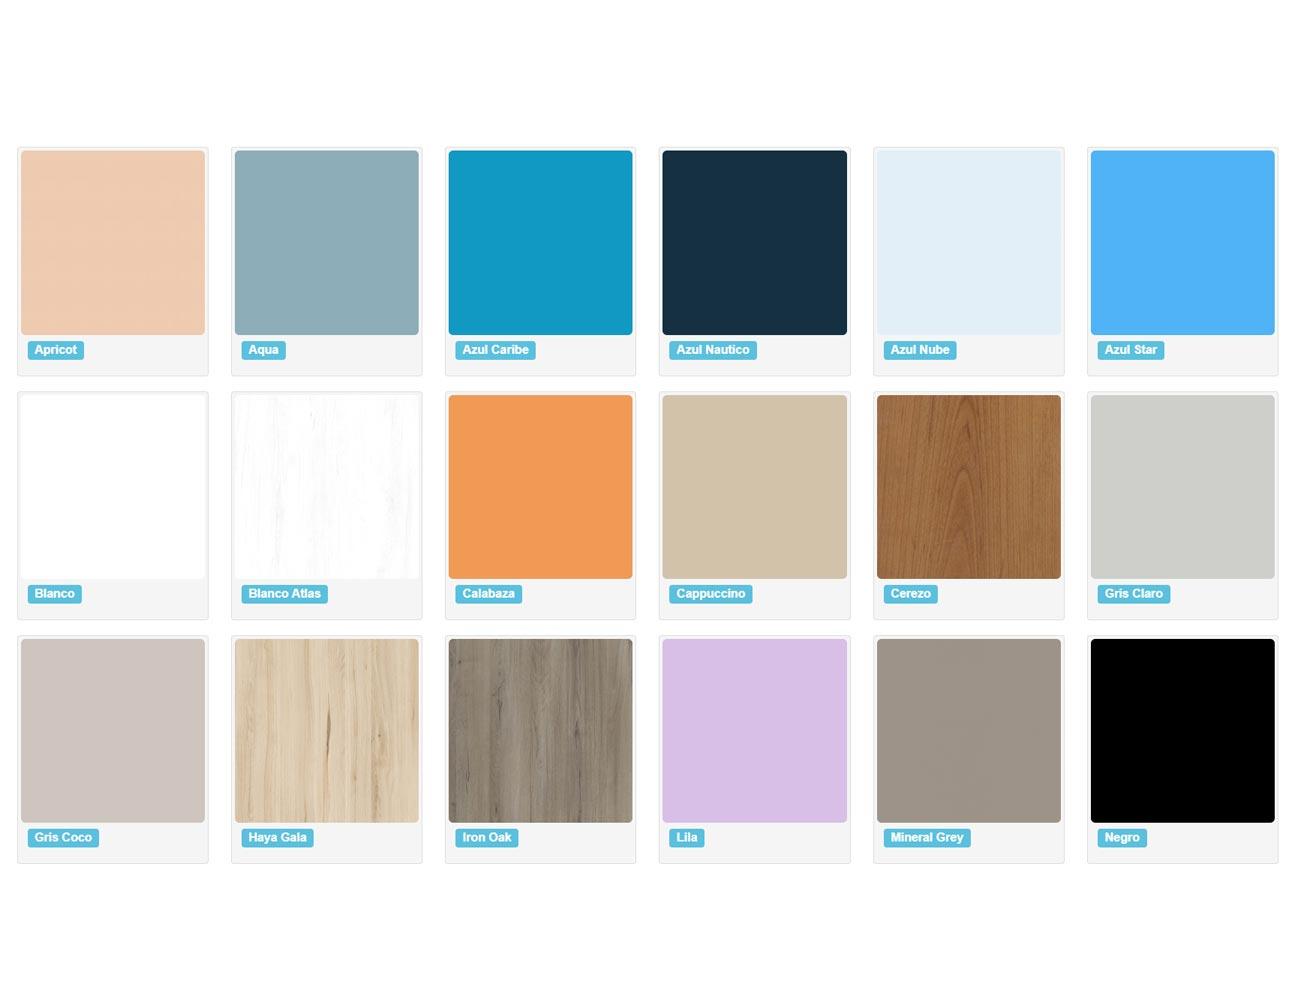 Colores219